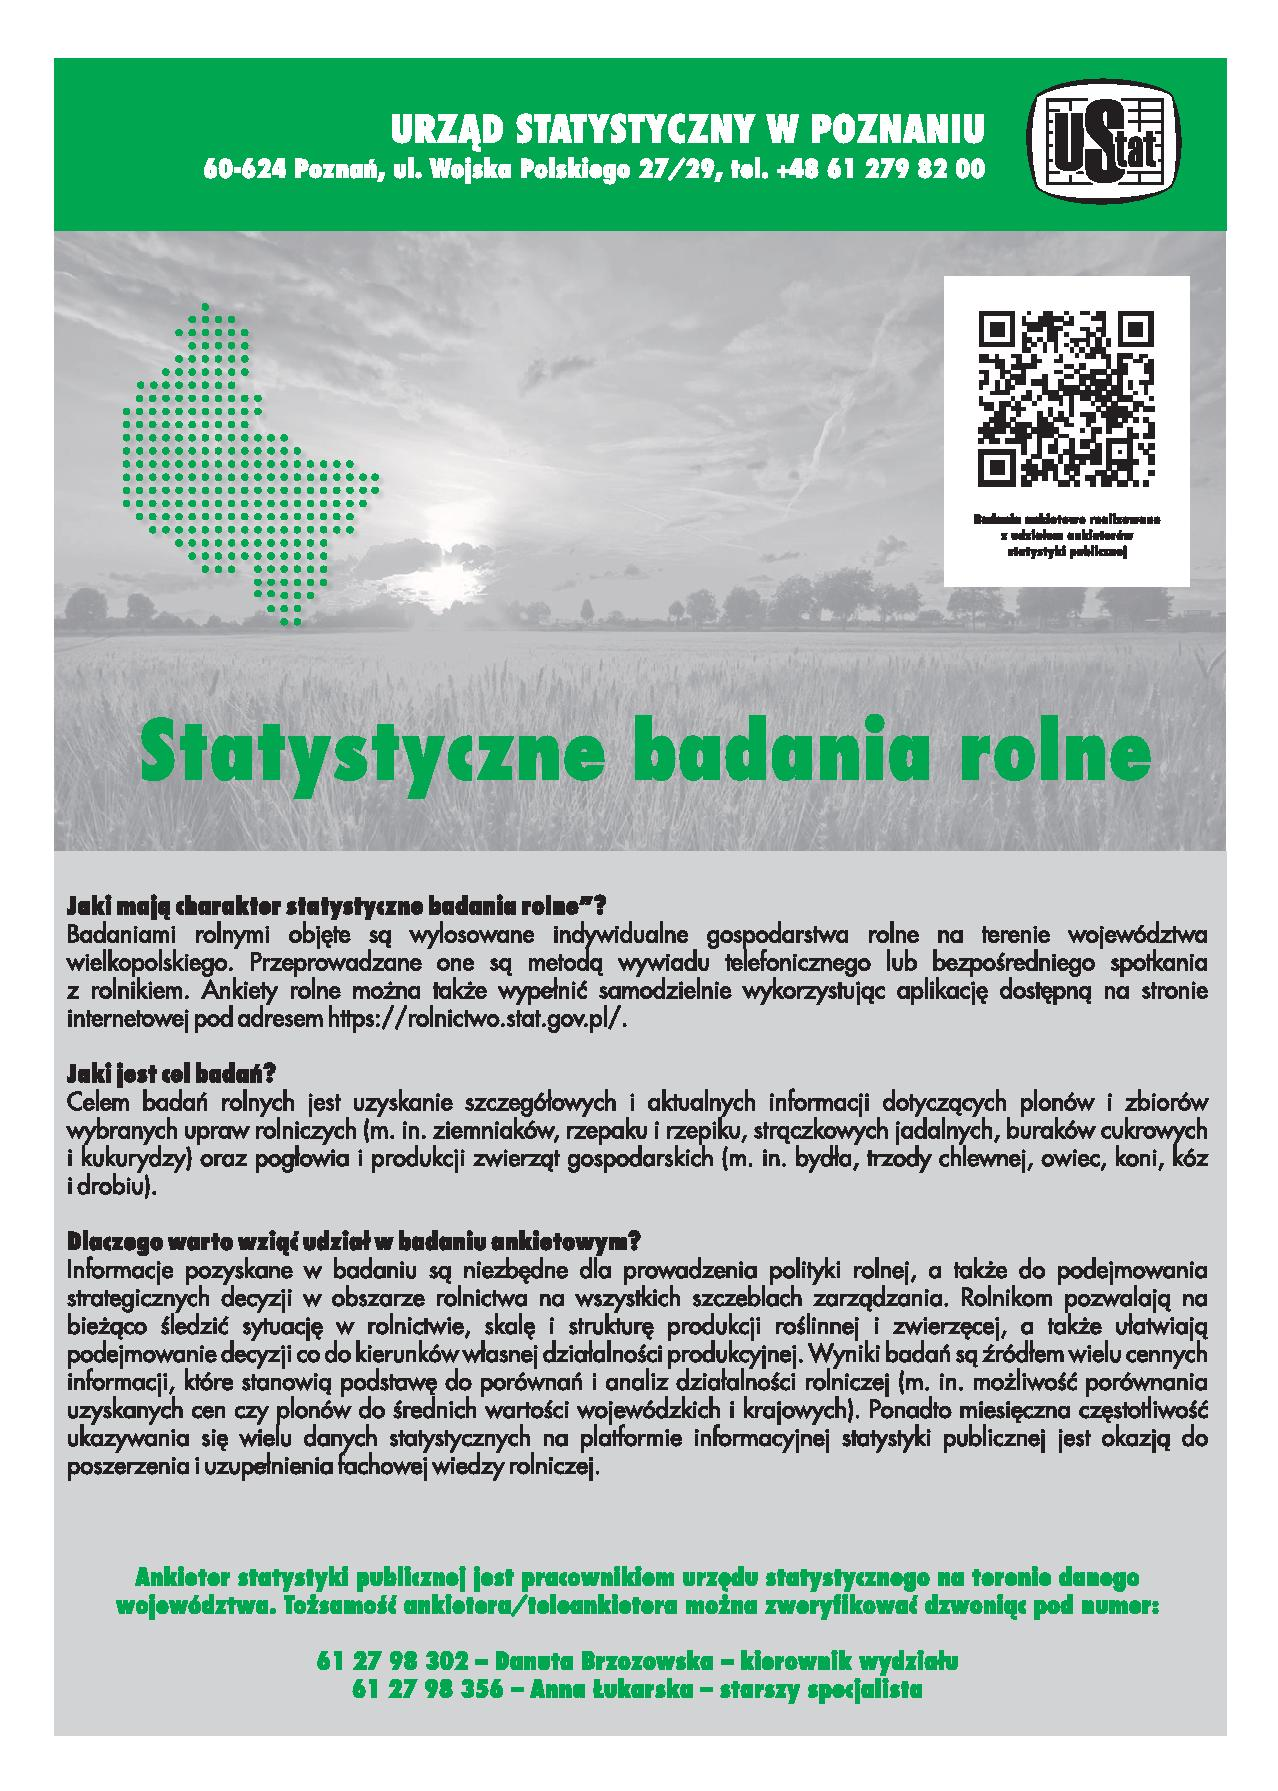 - badania_rolne_plakat_03.07.17.jpg